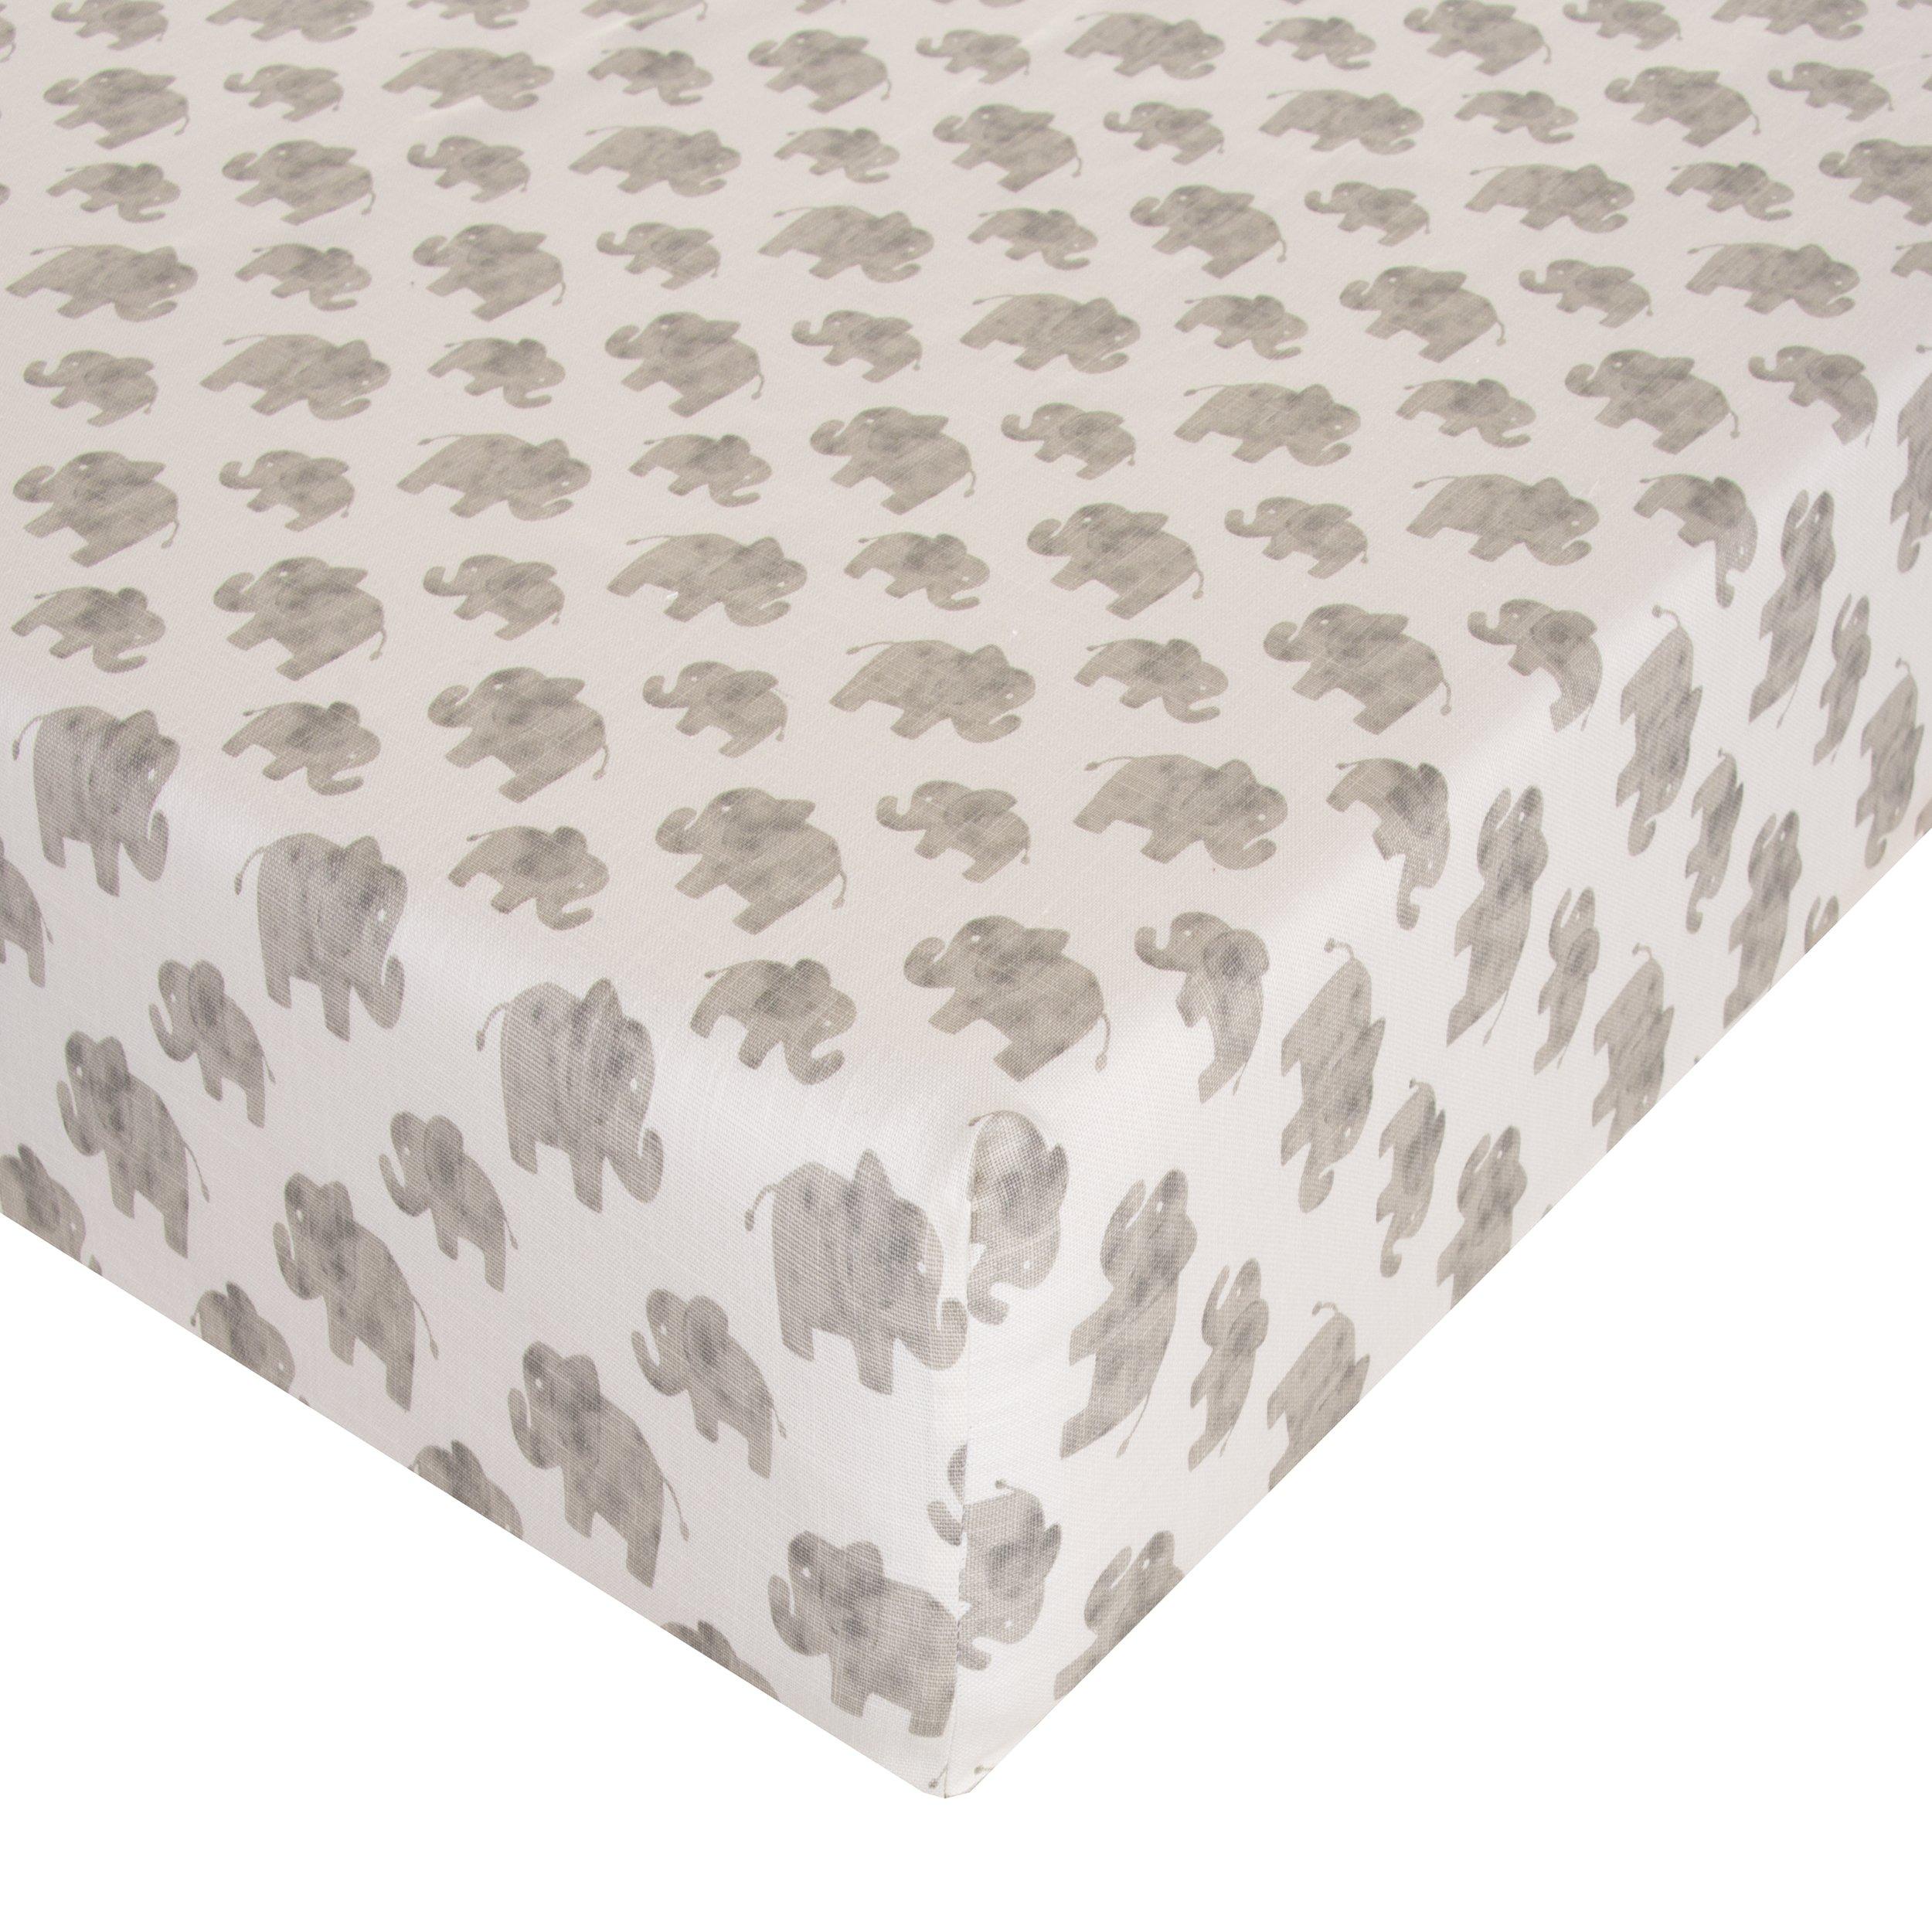 Glenna Jean Elephant Herd - Natural Crib Sheet Fitted 28''x52''x8'' Nursery Standard